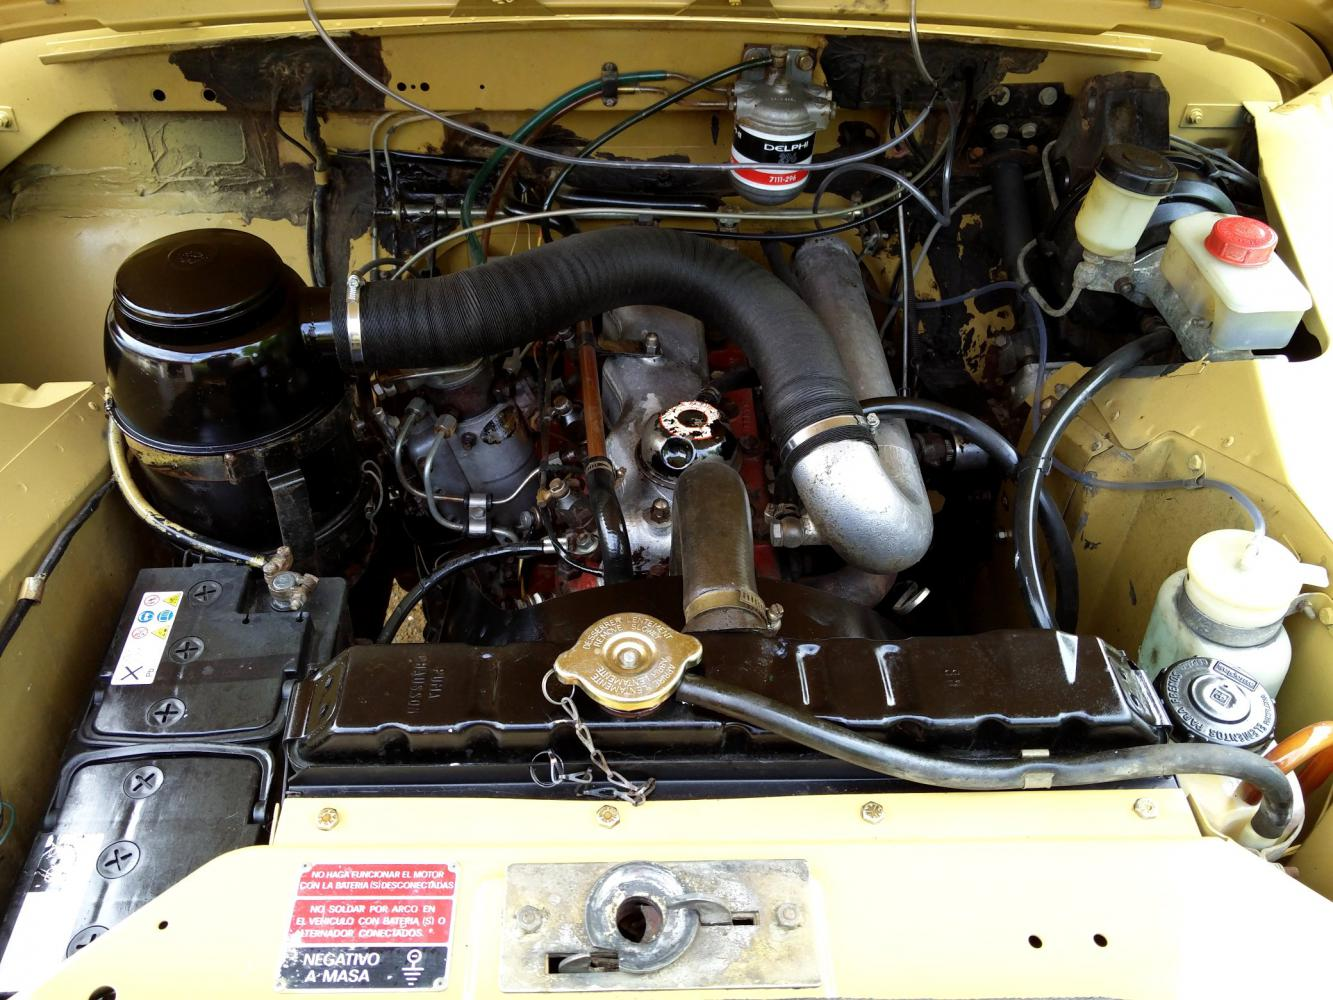 Click image for larger version  Name:1978 LR LHD Santana 88 Hardtop A Mustard Yellow engine bay.jpg Views:58 Size:196.6 KB ID:296617